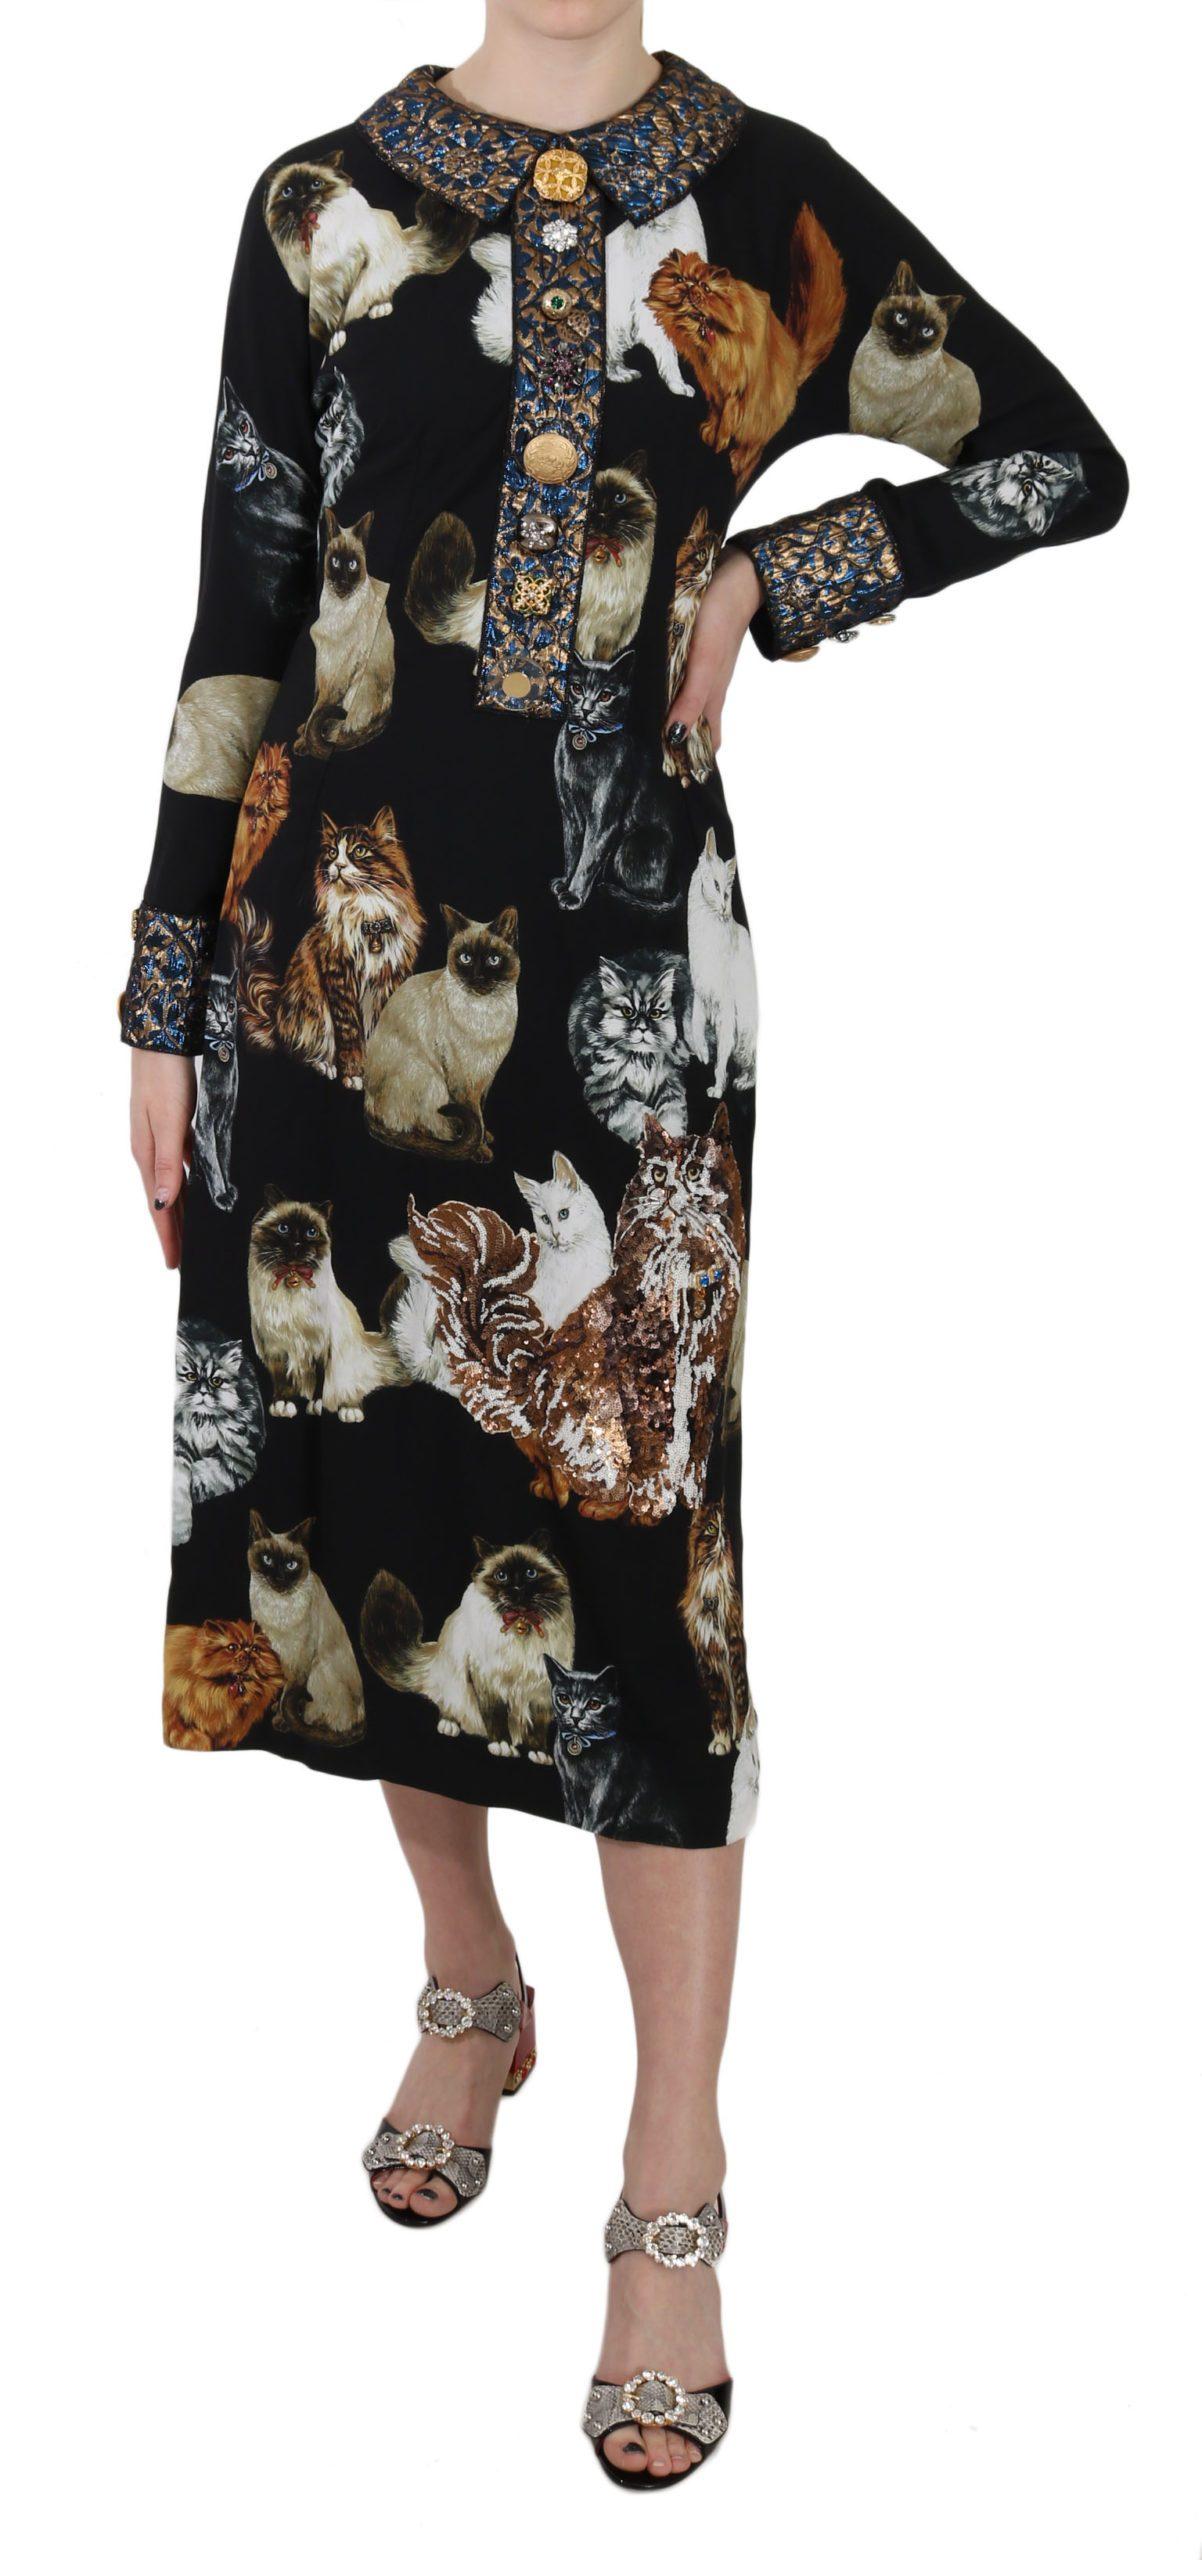 Dolce & Gabbana Women's Bengal Cat Crystal Jacquard Dress Black DR1661 - IT42 M